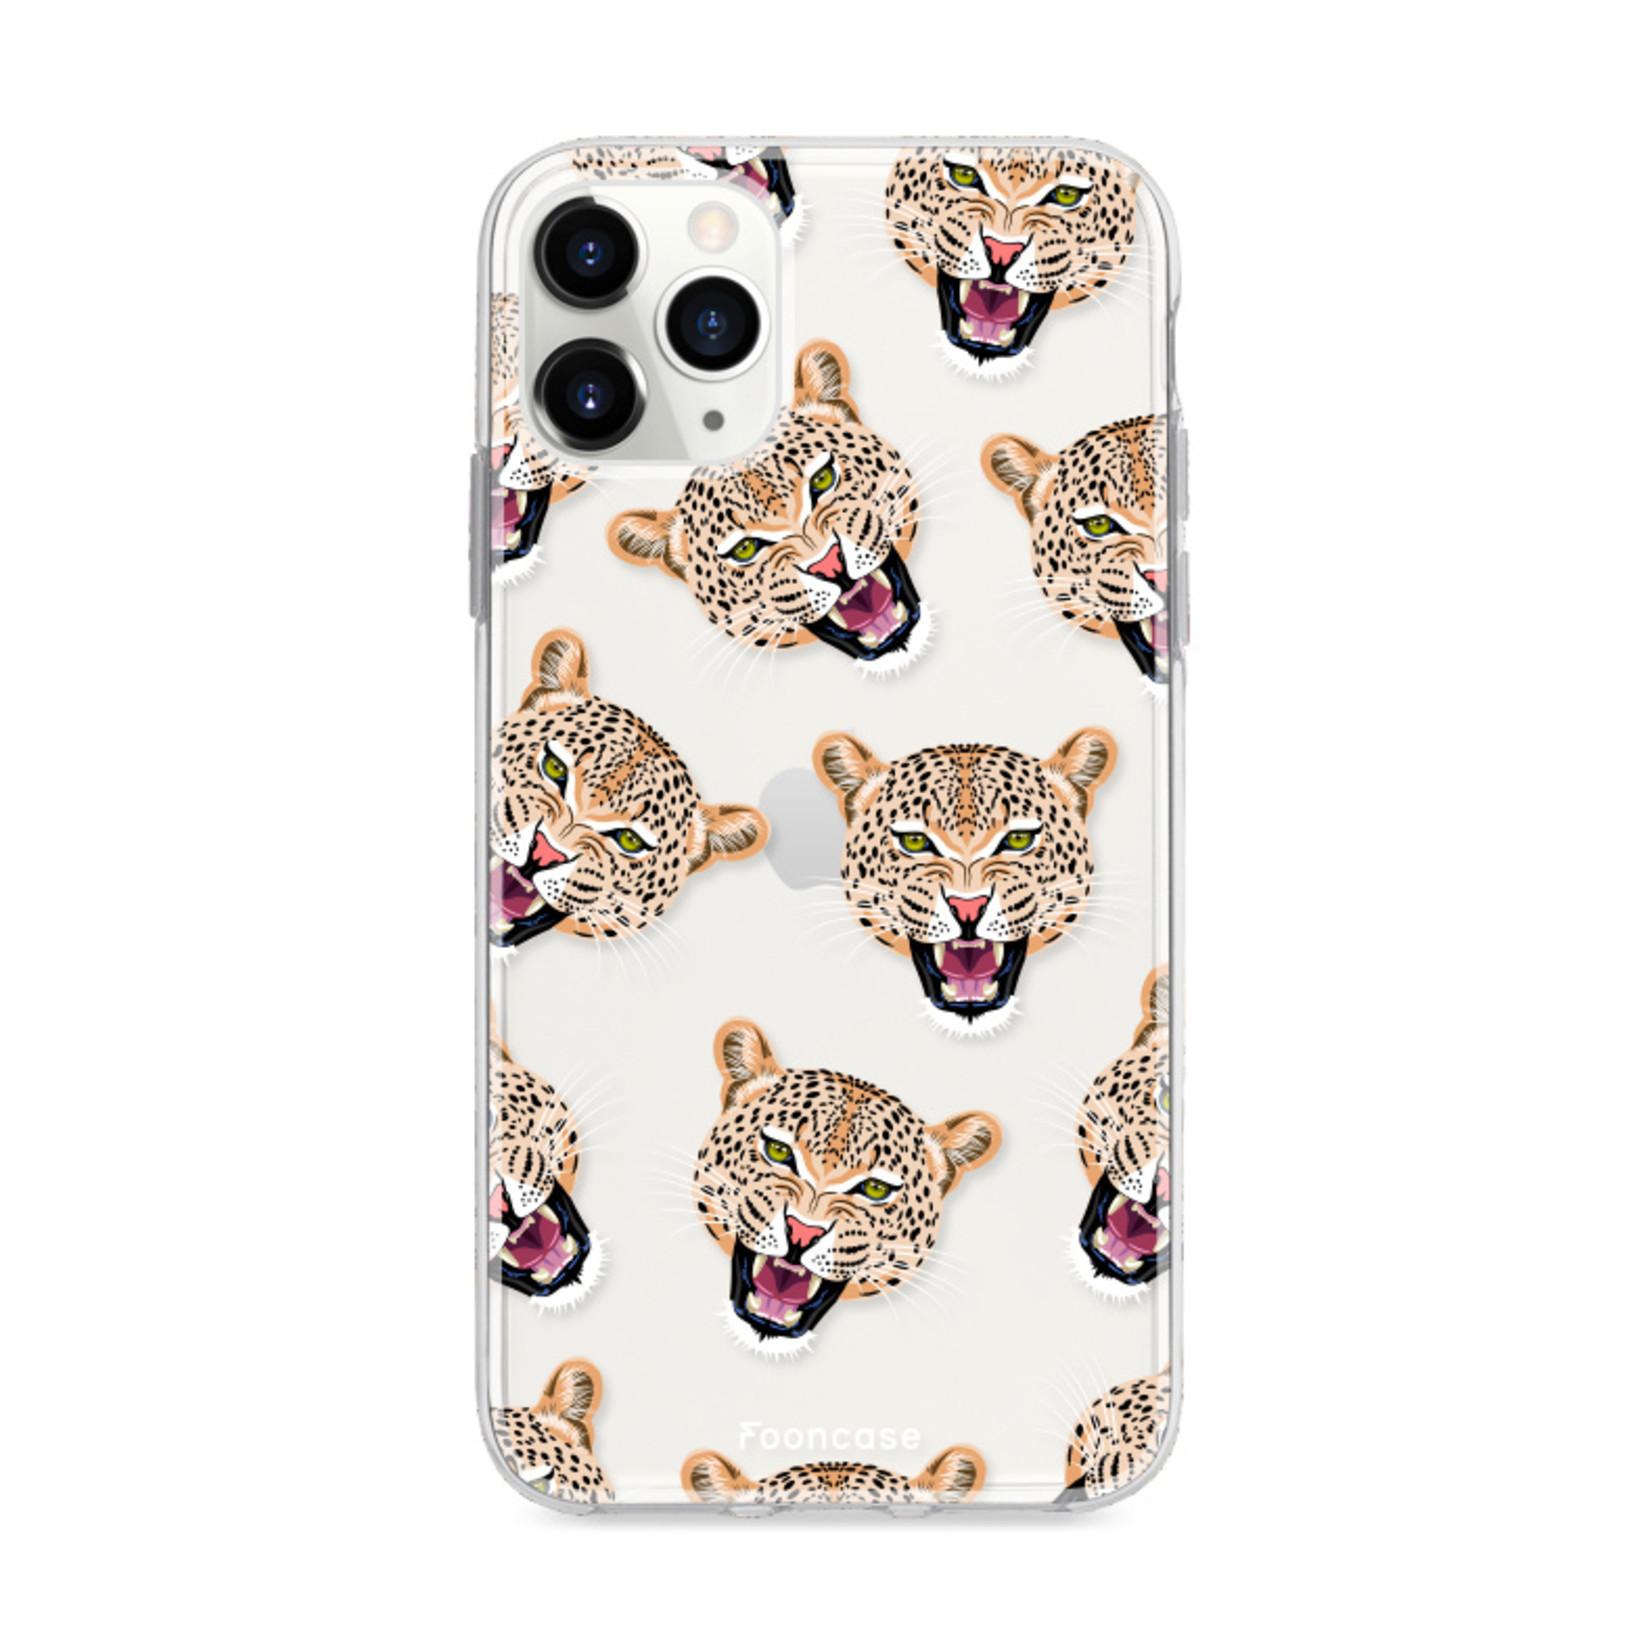 FOONCASE iPhone 12 Pro hoesje TPU Soft Case - Back Cover - Cheeky Leopard / Luipaard hoofden